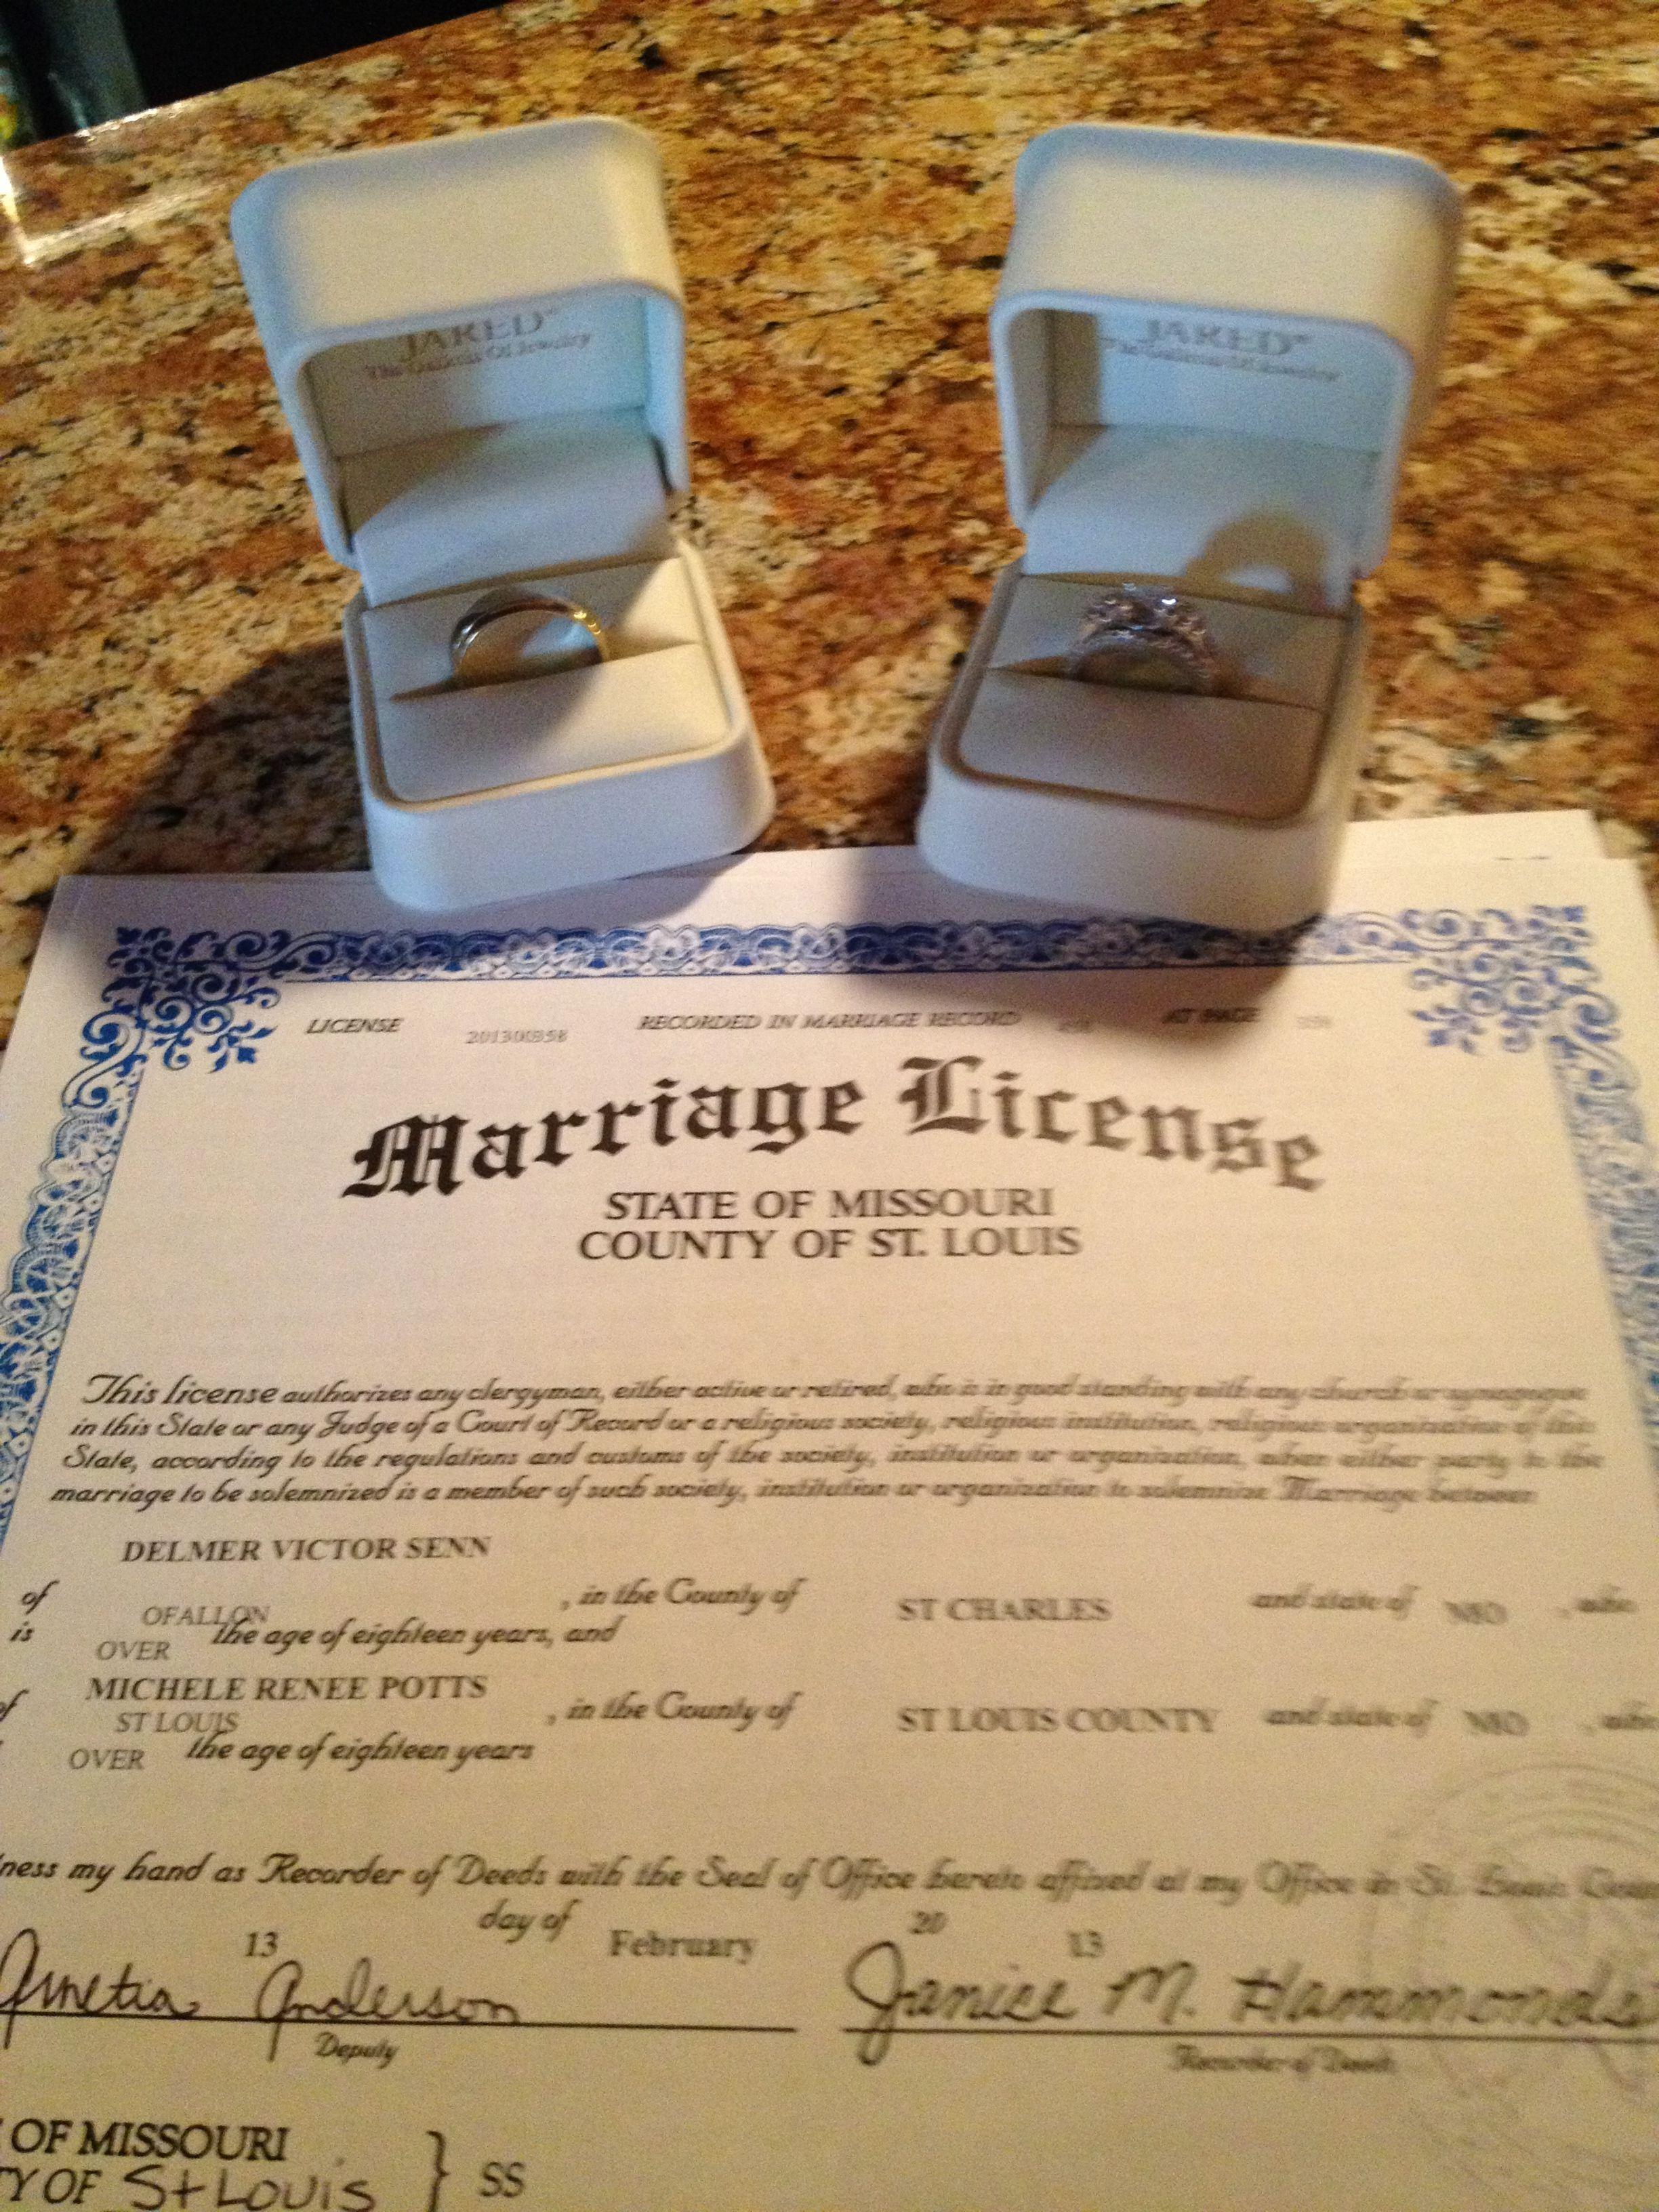 da487c6fe297e4622d77ca6a0a50efd8 - How To Get Licensed To Marry Someone In Missouri